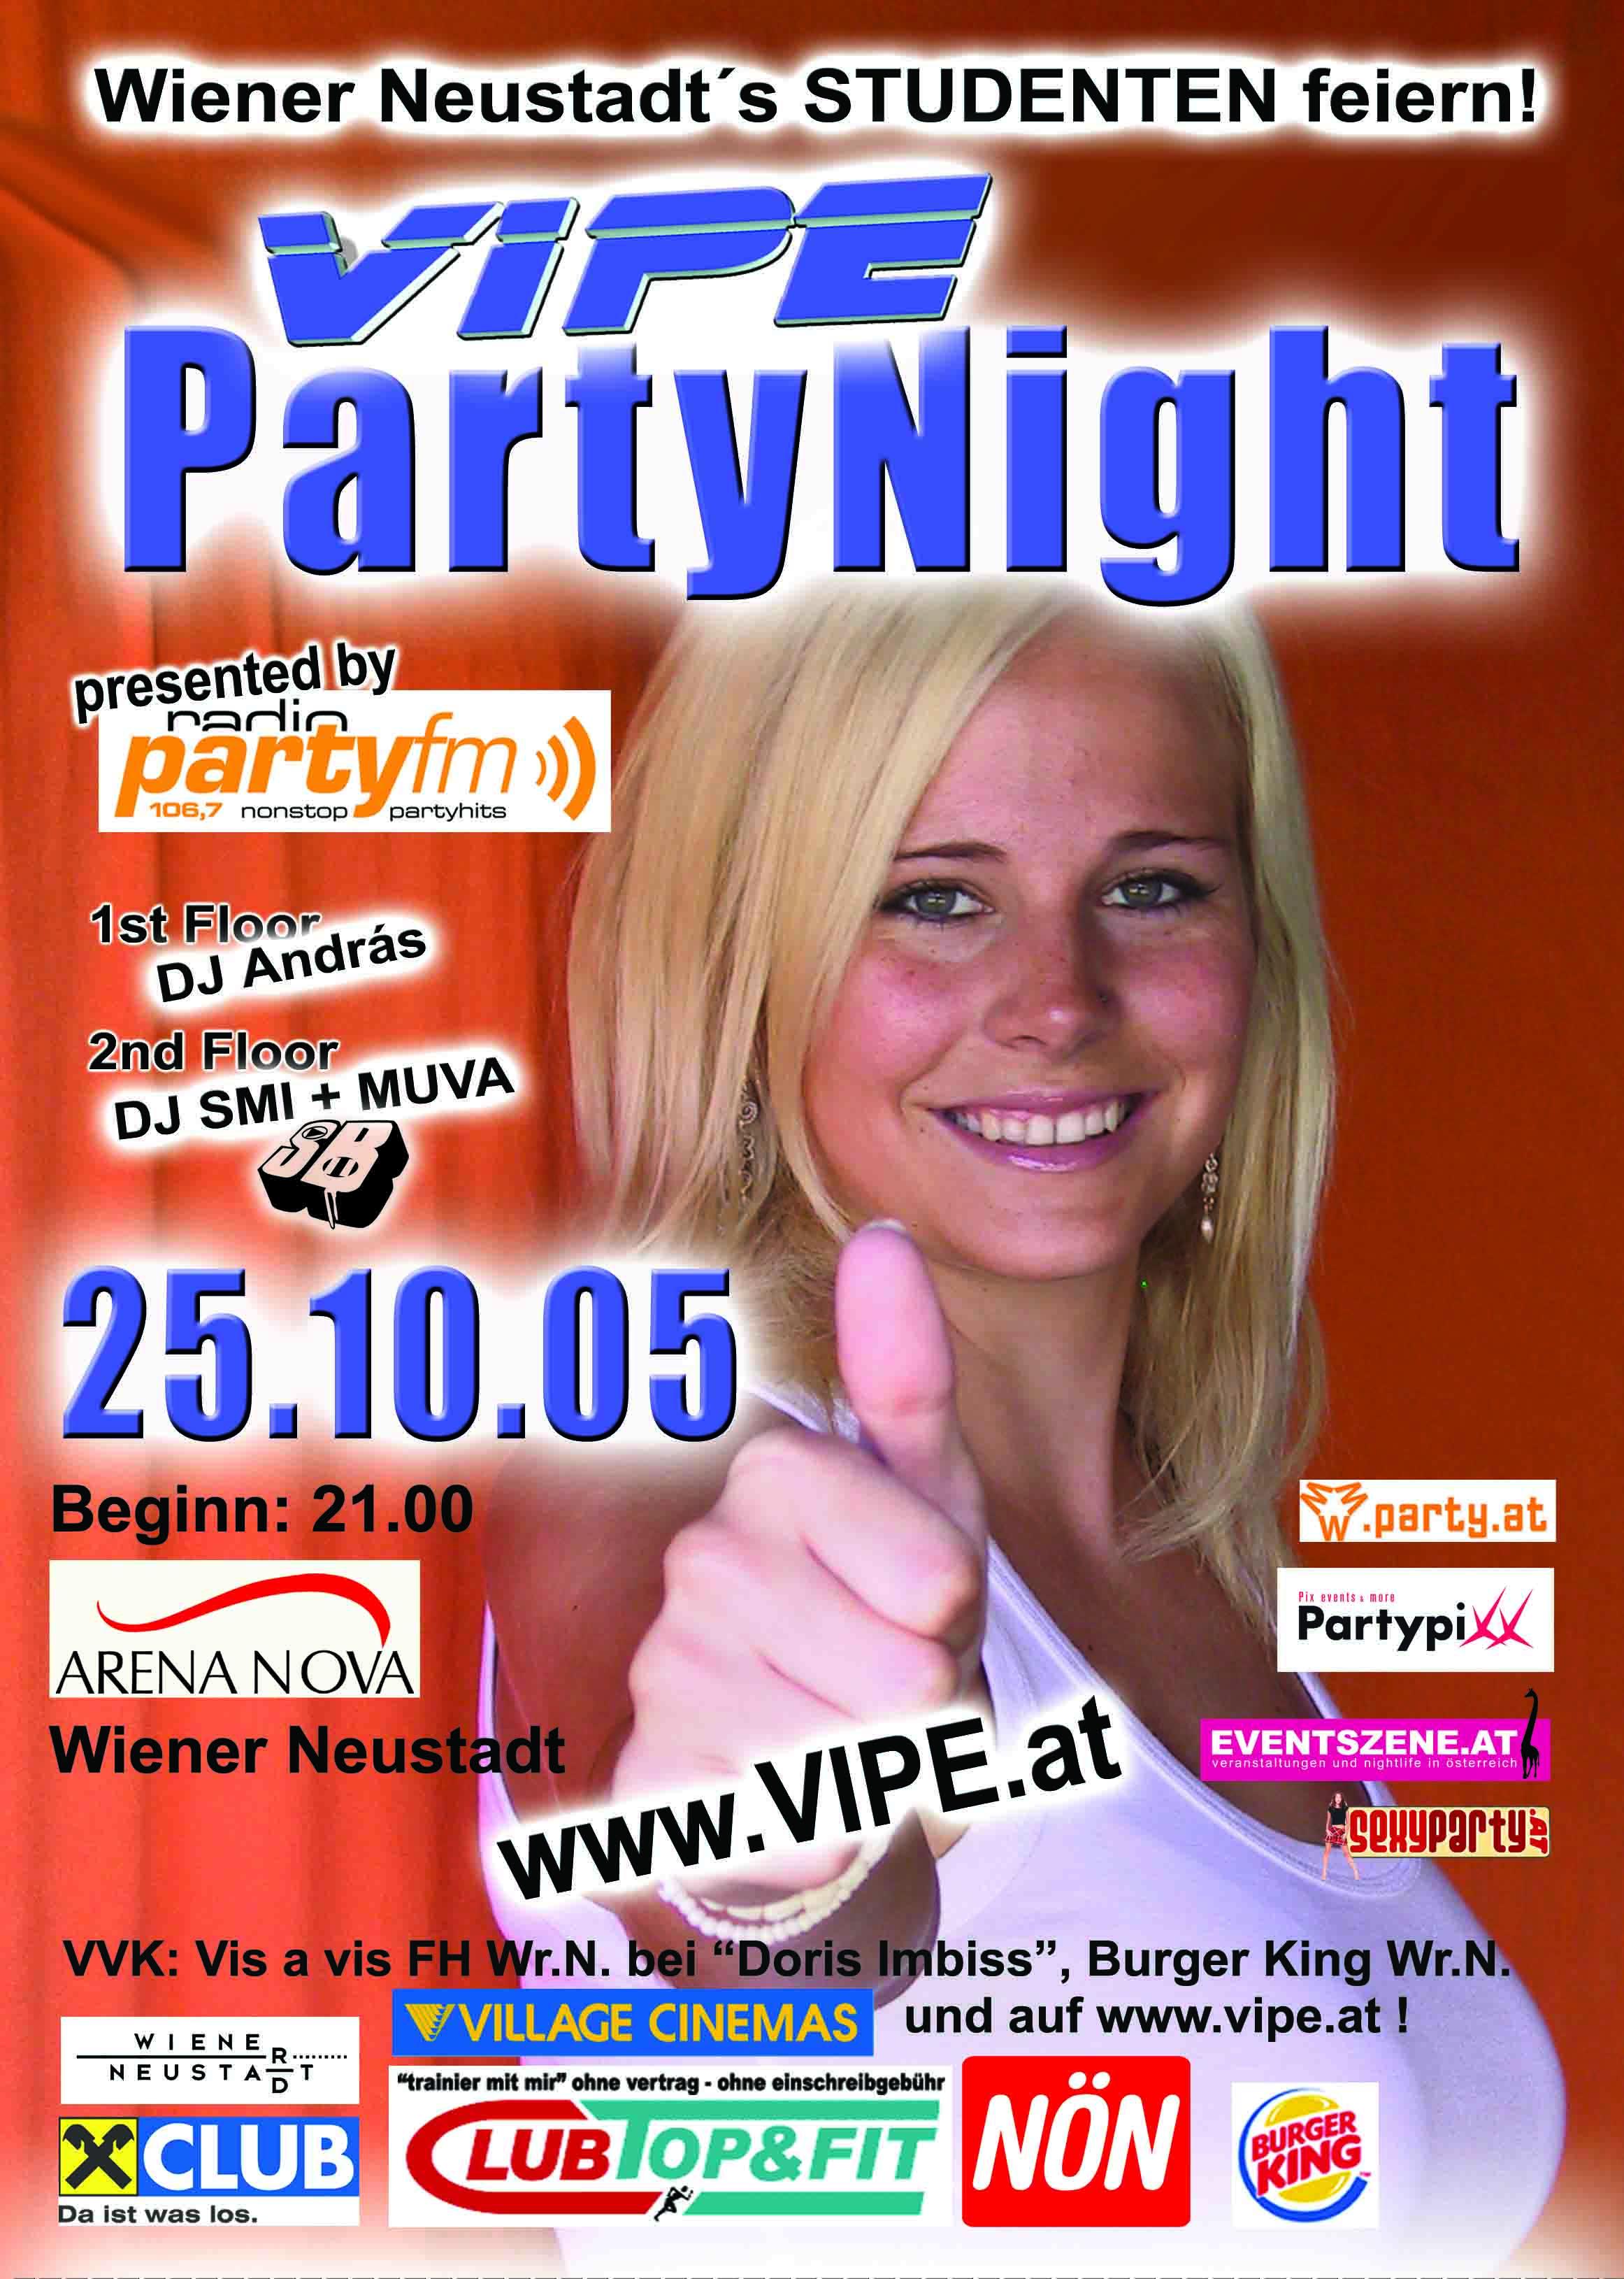 Struttinbeats-wiener-neustadt-VIPE Partynight - 2005 - Fotos